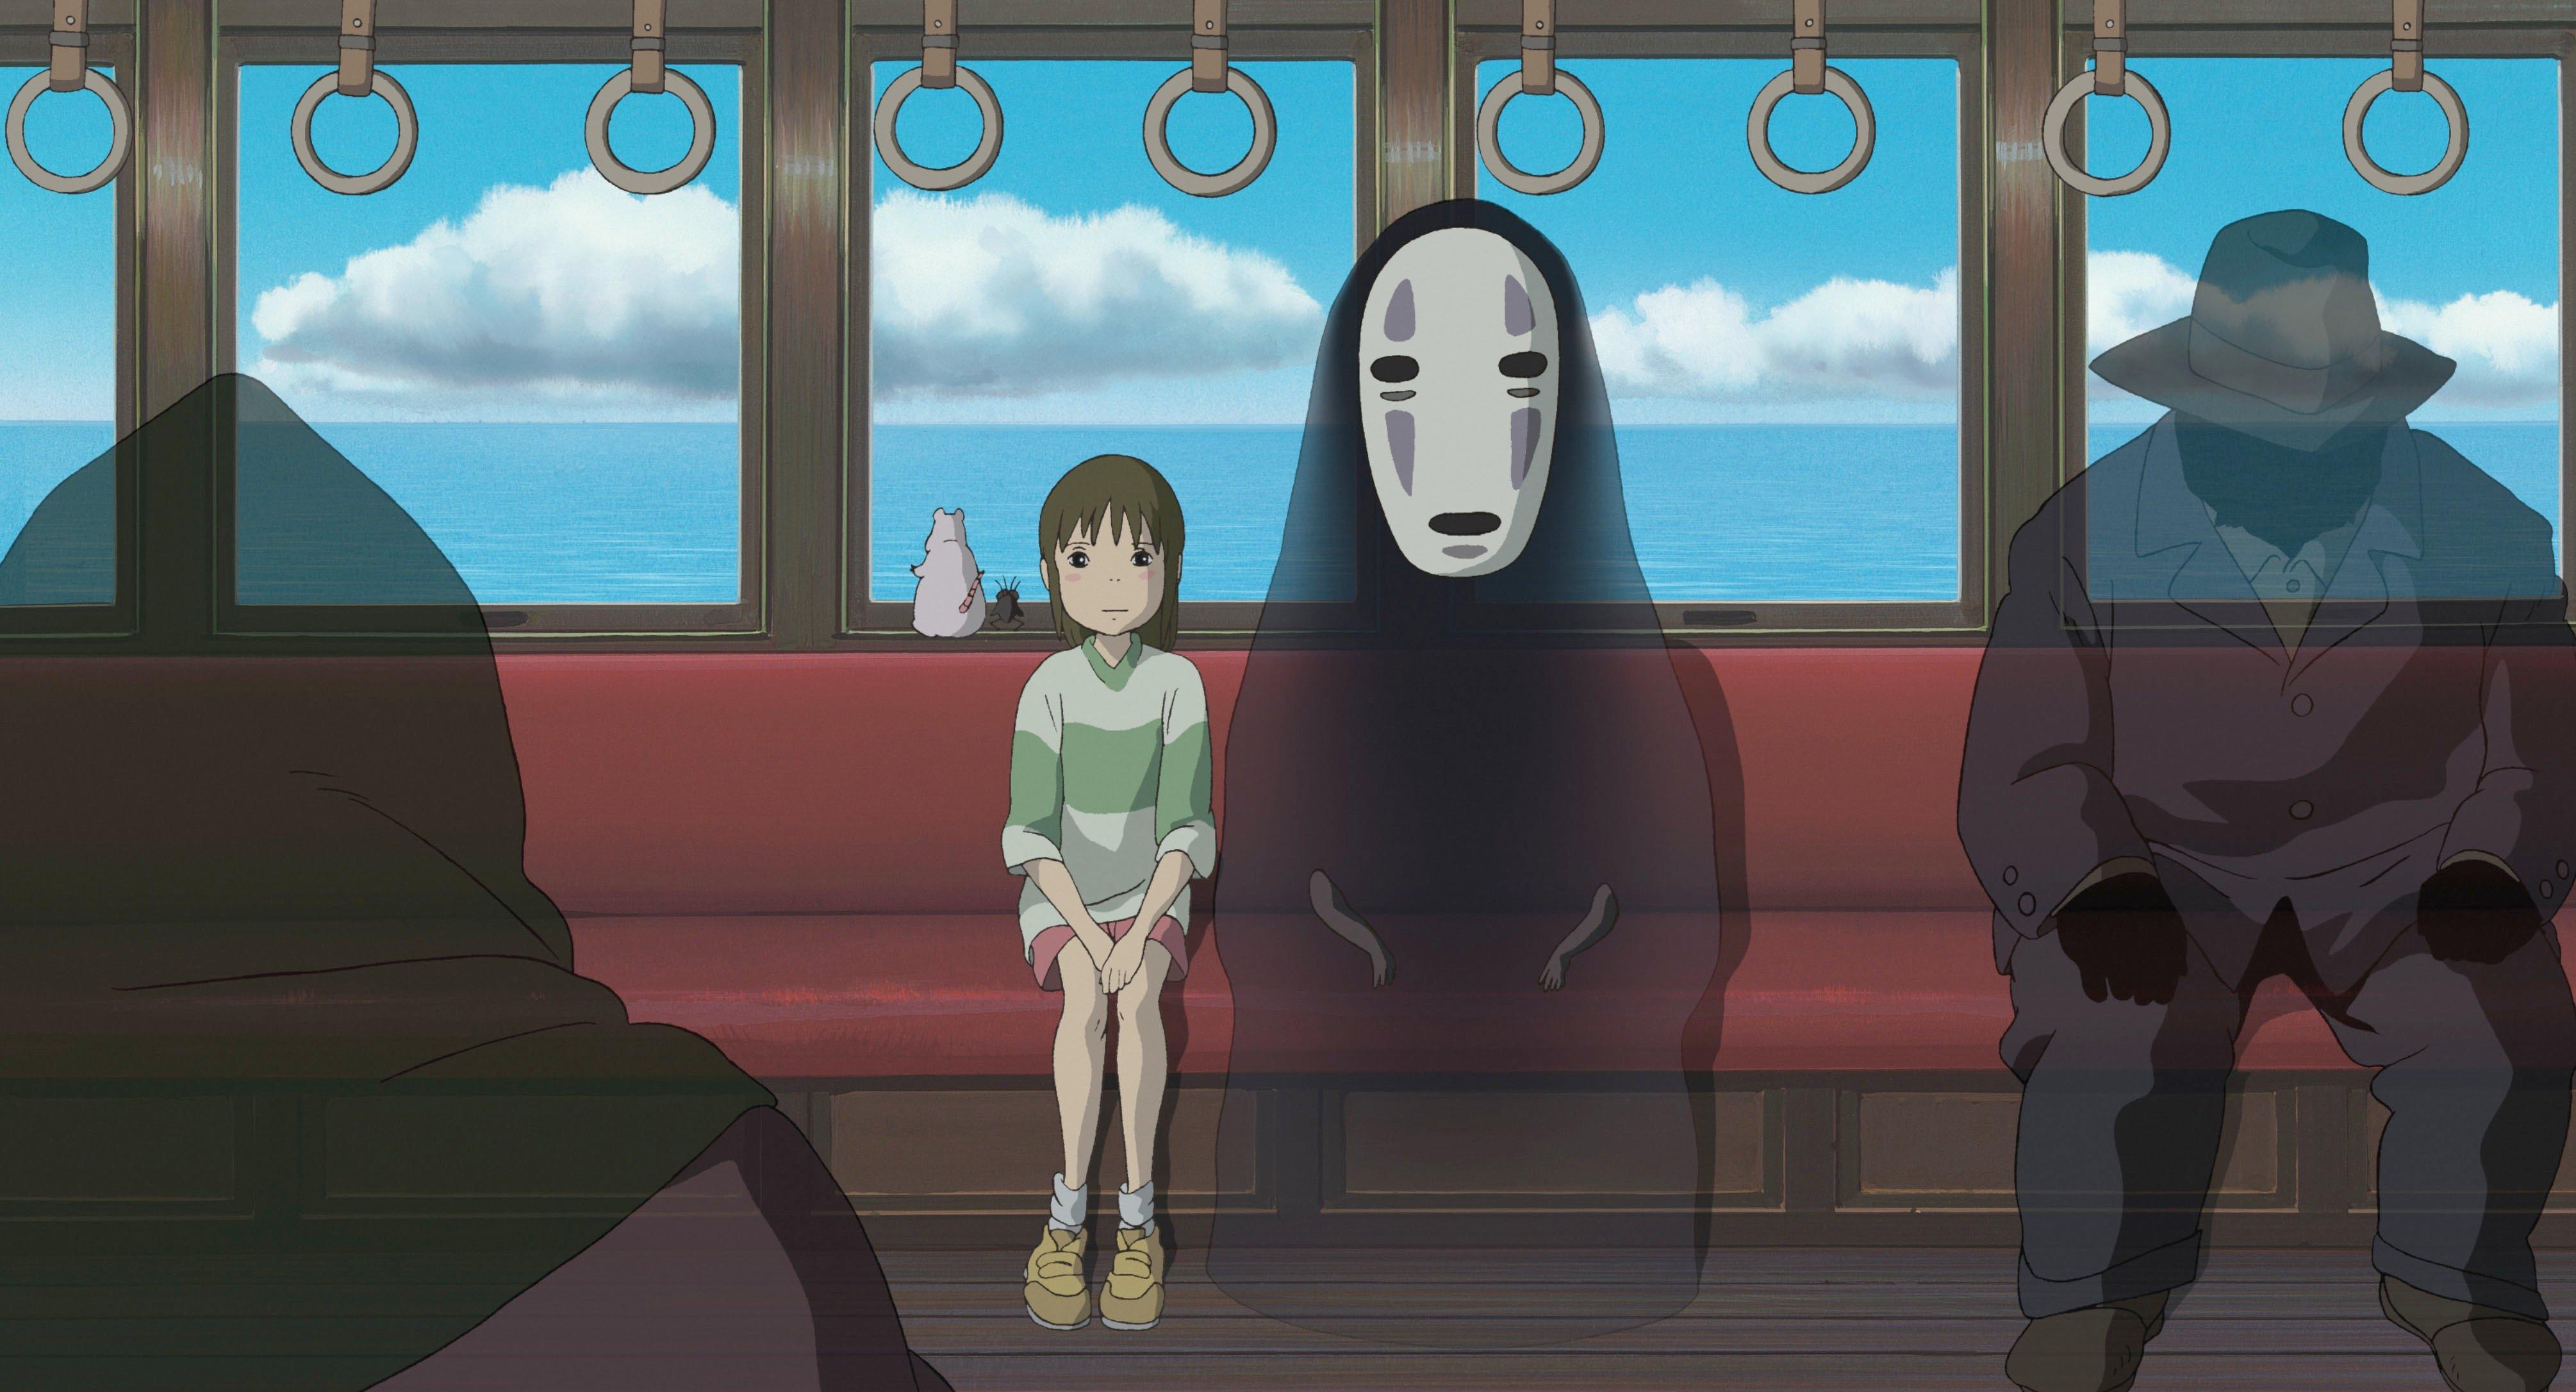 Fondos de pantalla Anime Kaonashi (No-Face) de El viaje de Chihiro Película